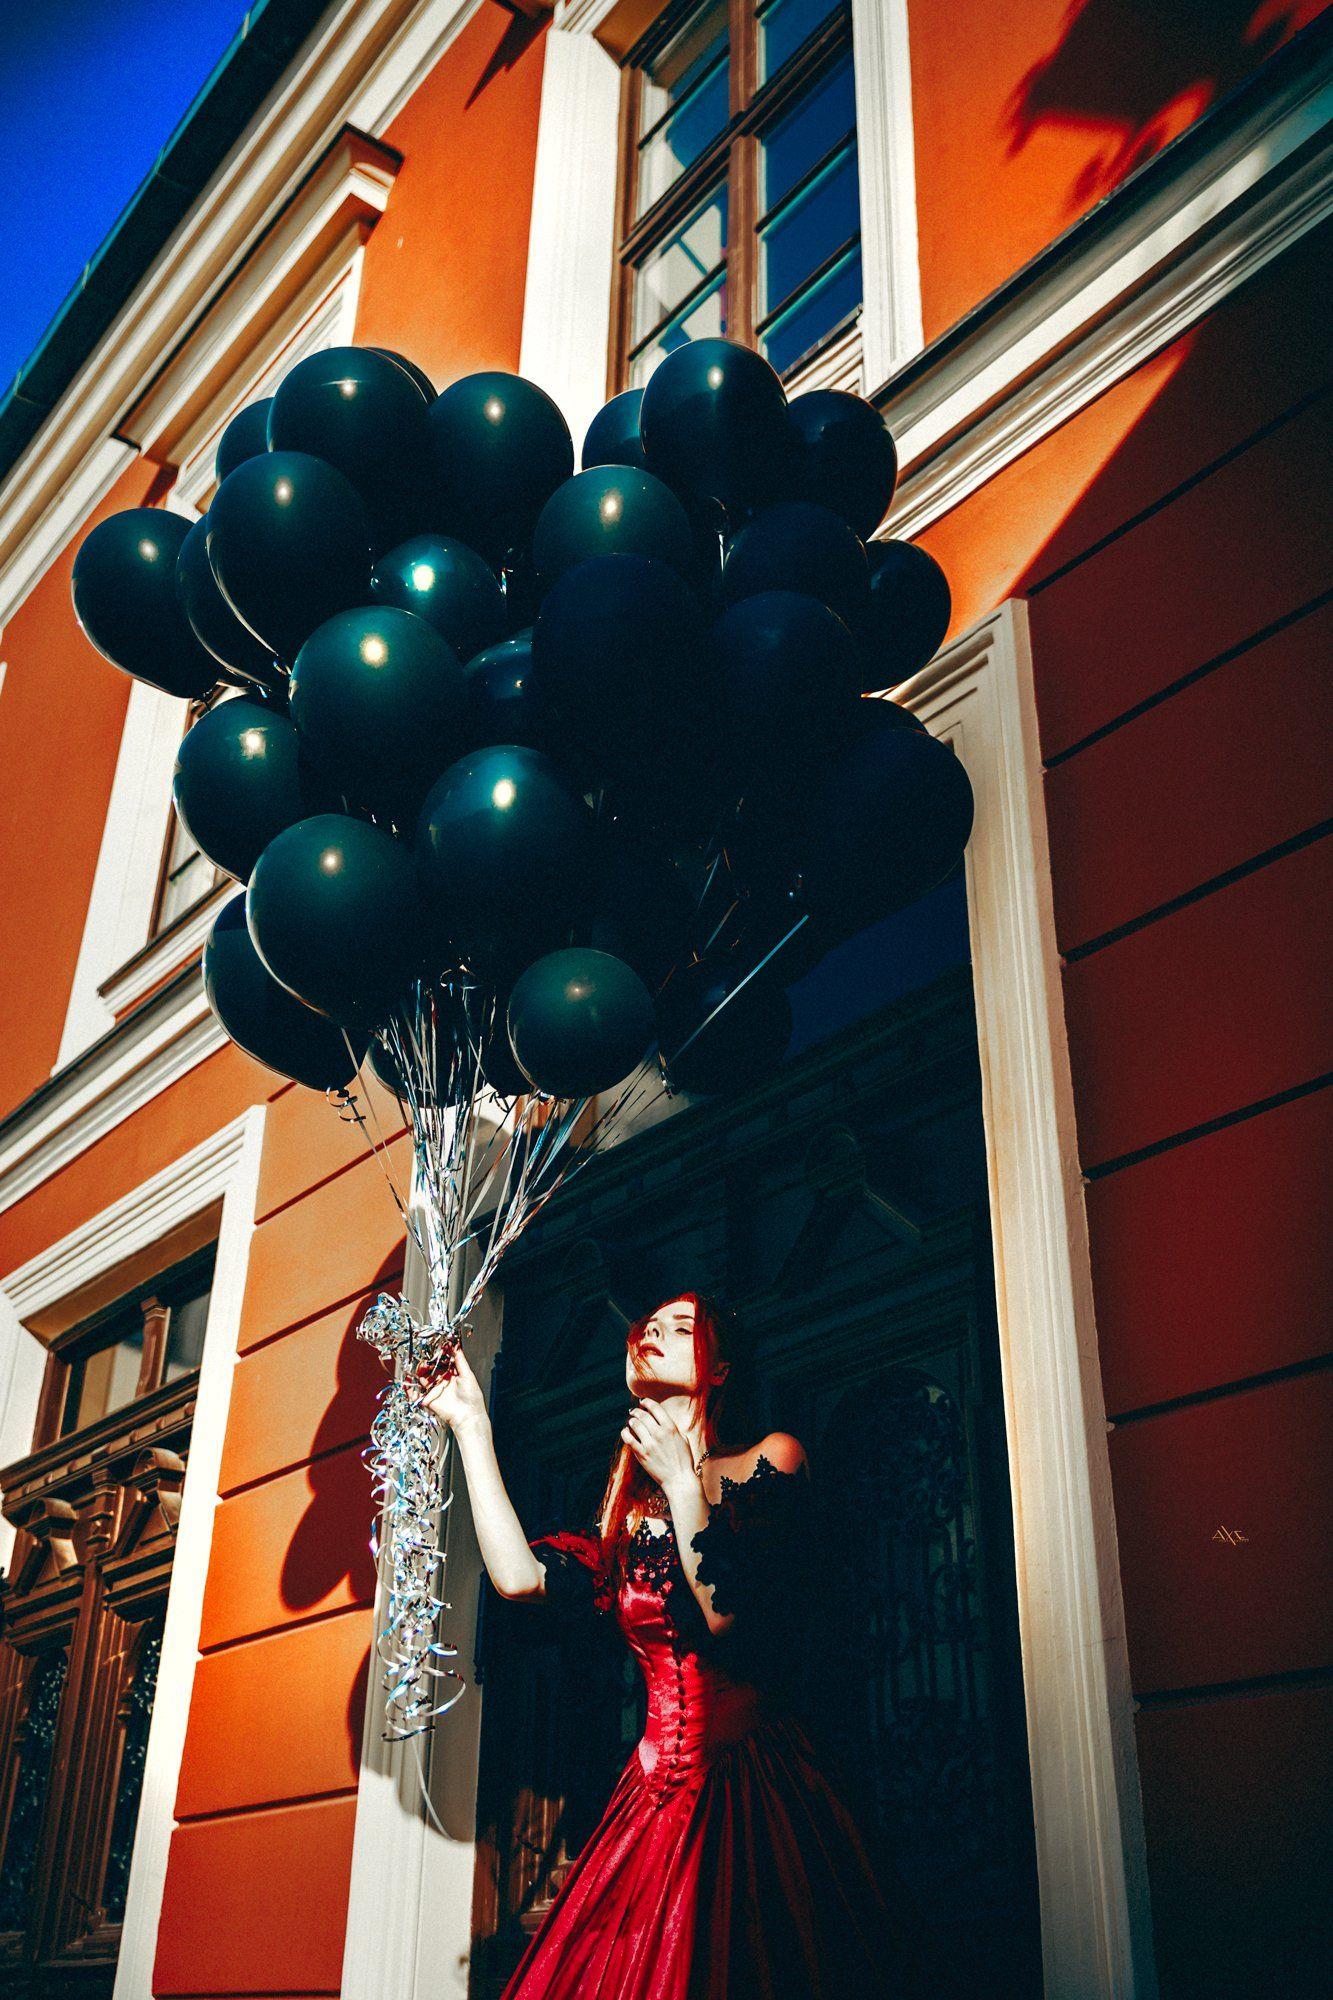 woman, portrait, fashion, art, beauty, dress, balloons, conceptual, Руслан Болгов (Axe)